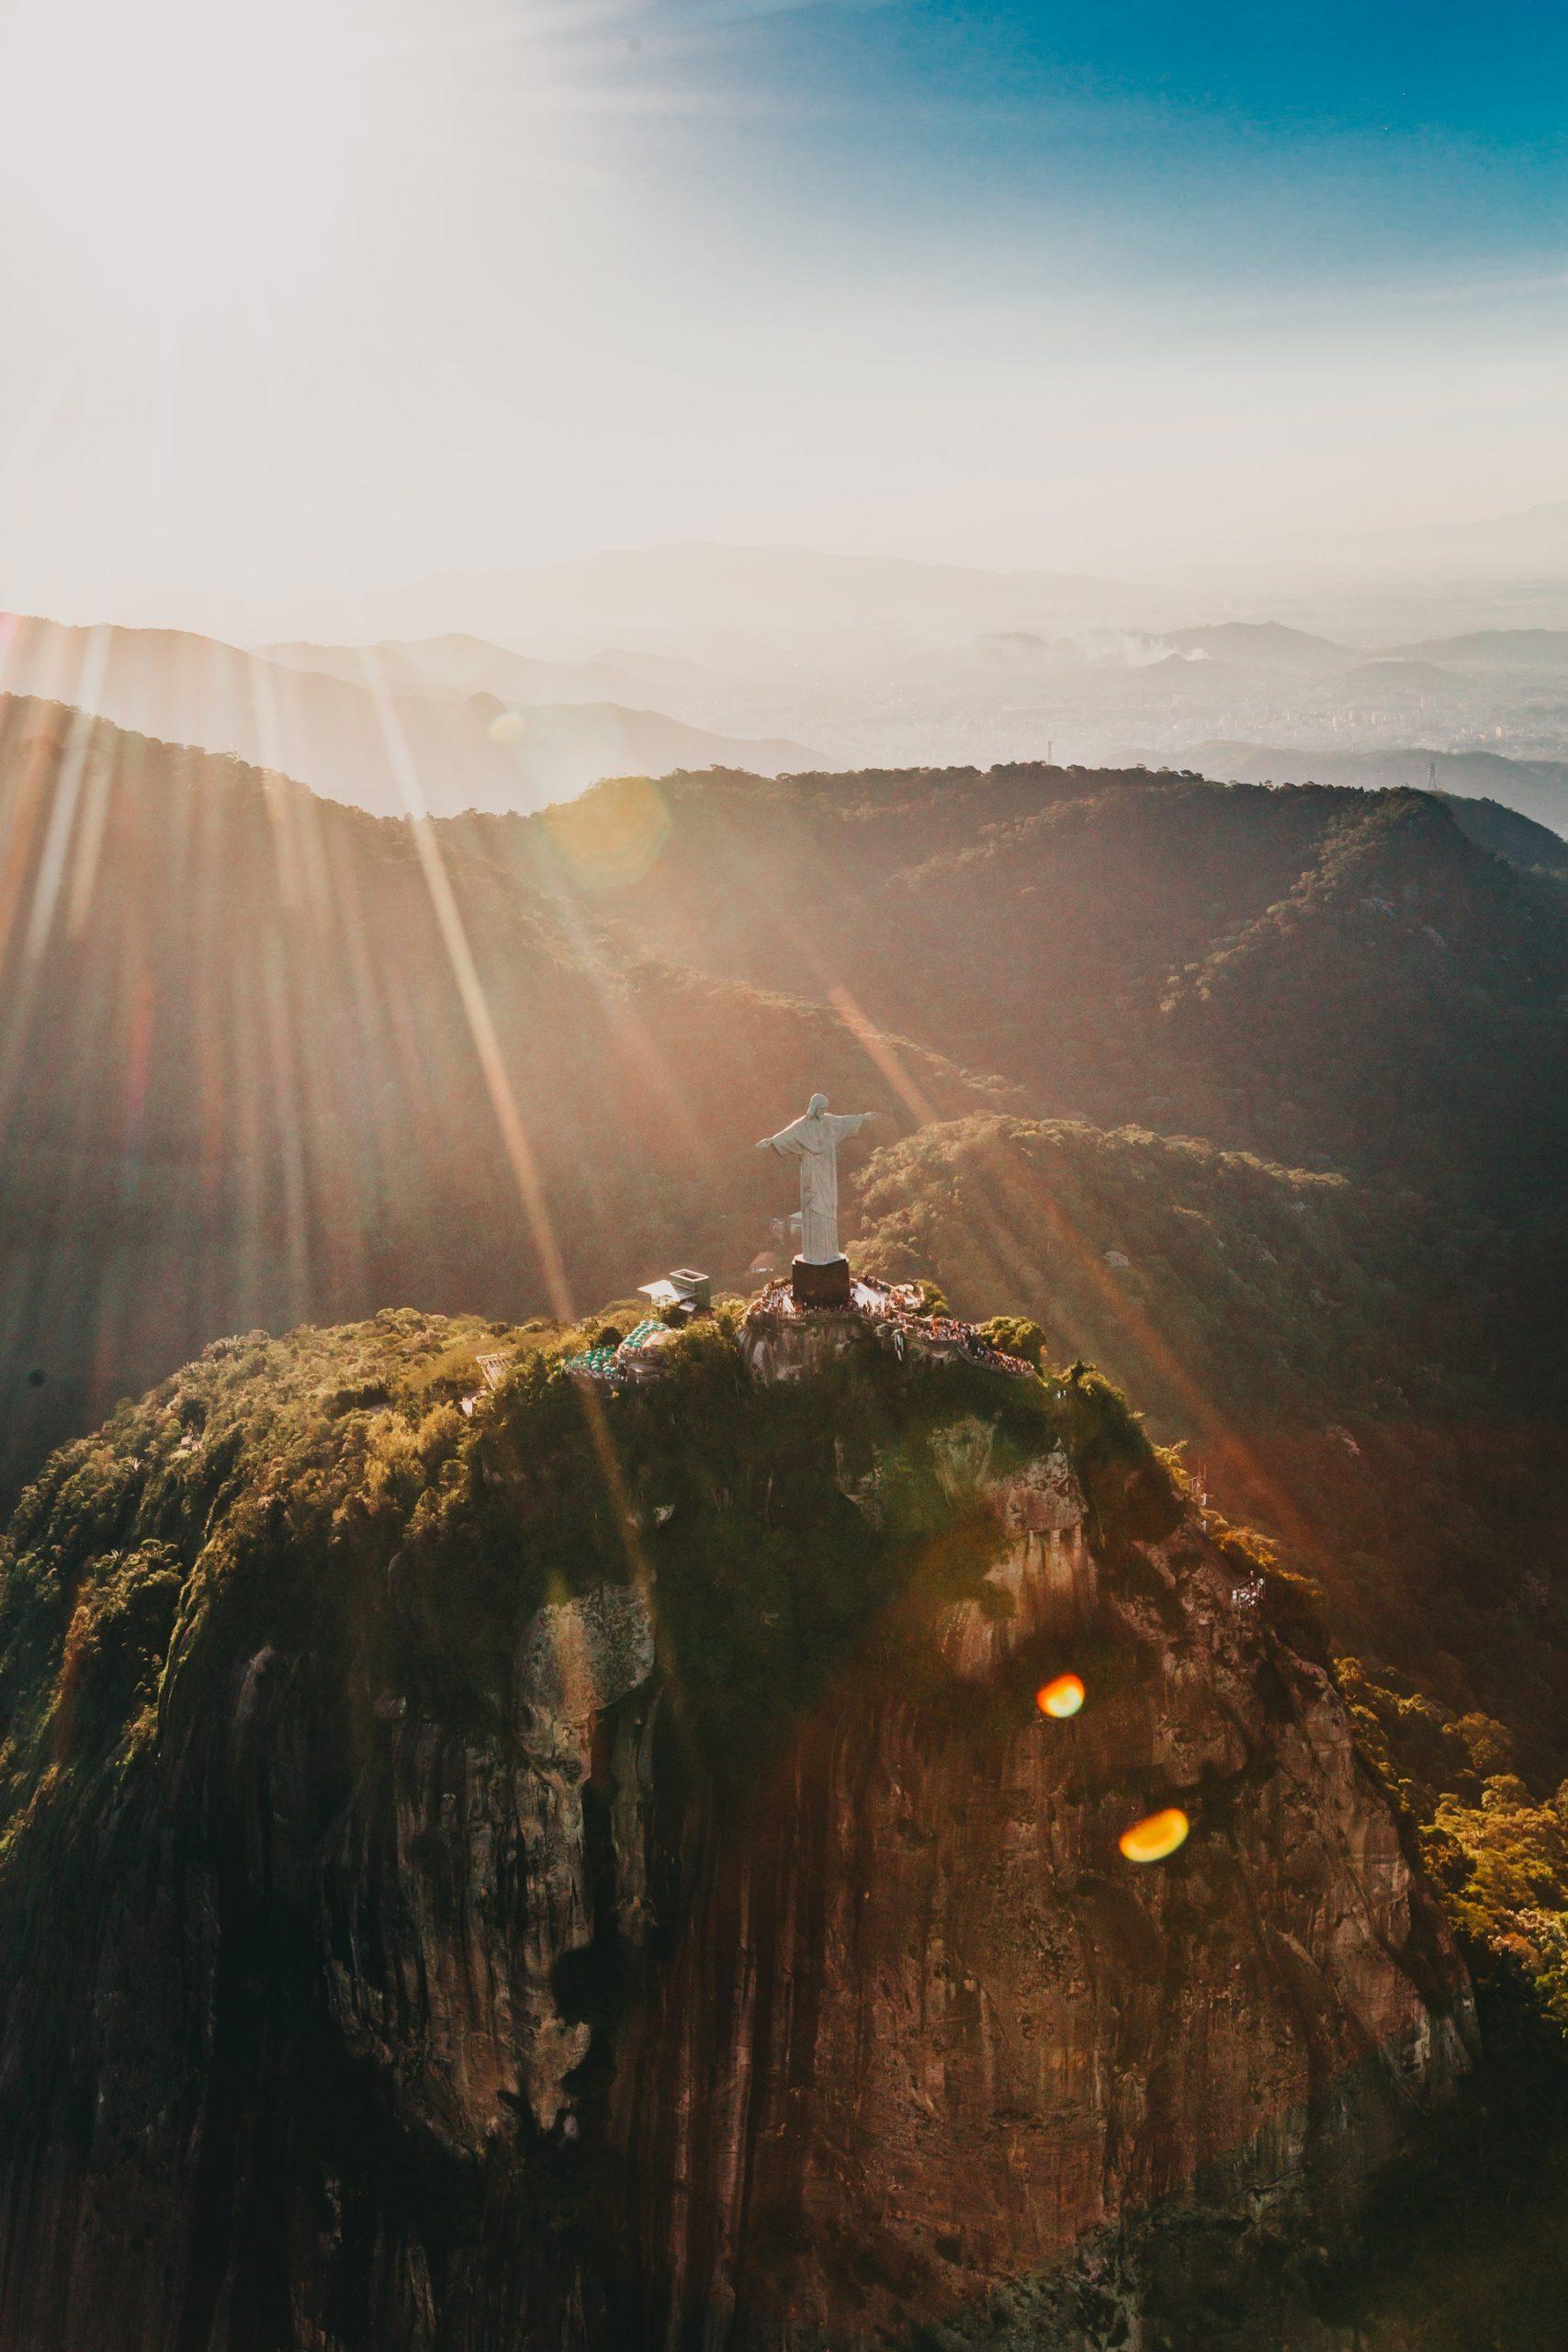 Christ the Redeemer in Rio de Janerio, Brazil